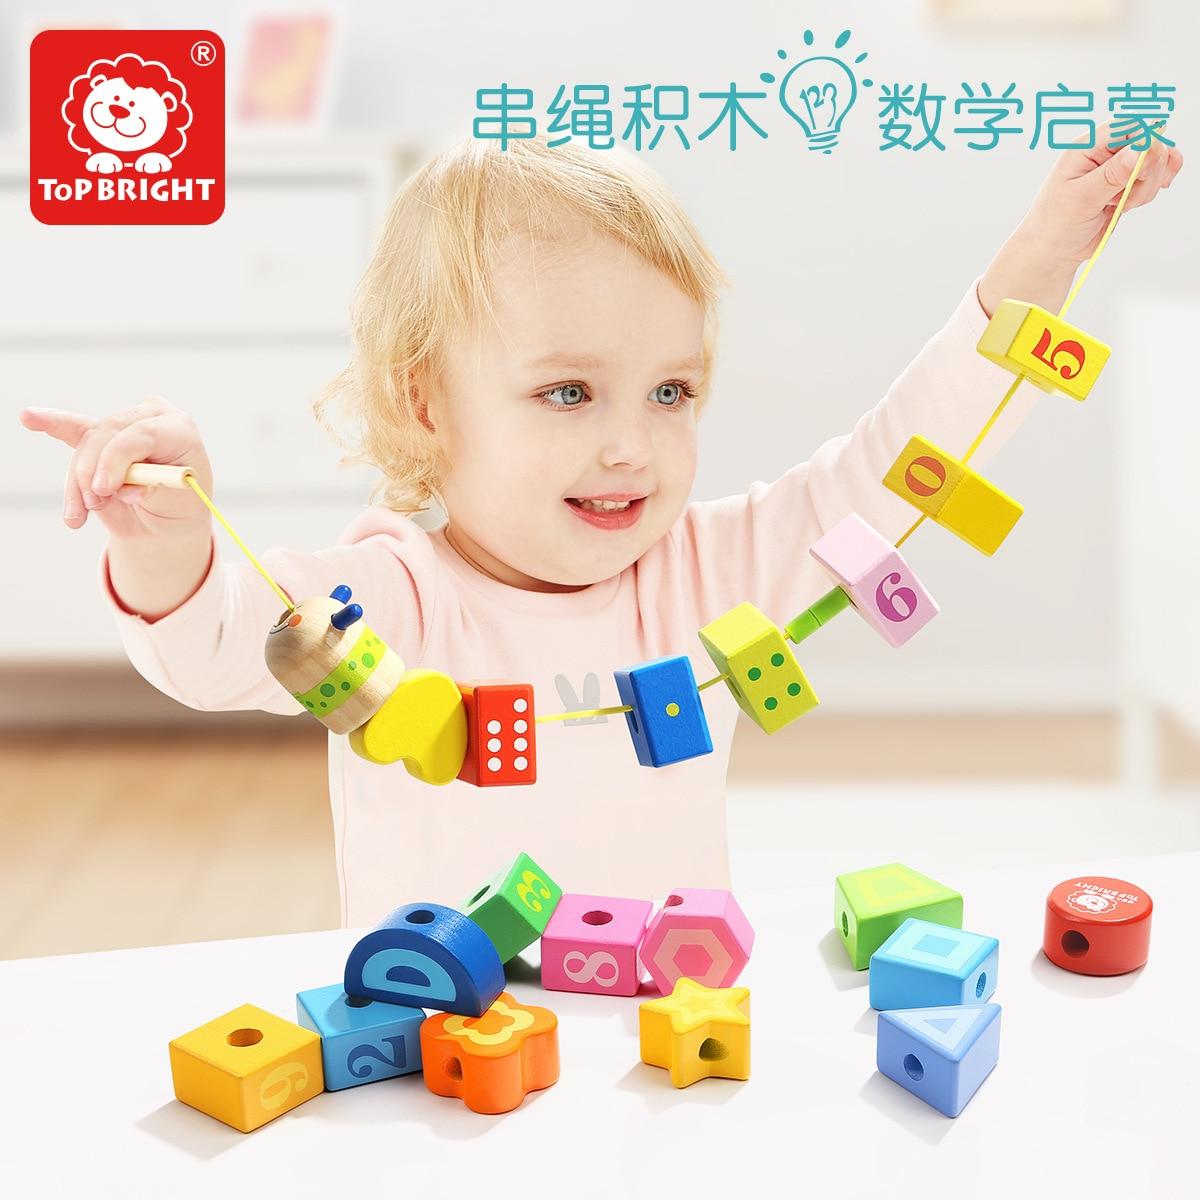 TOPBRIGHT Beaded Bracelet Children Toy Building Blocks Wear Beads Baby Toy Educational 1-2-3-Year-Old GIRL'S Handmade Wearing Ro